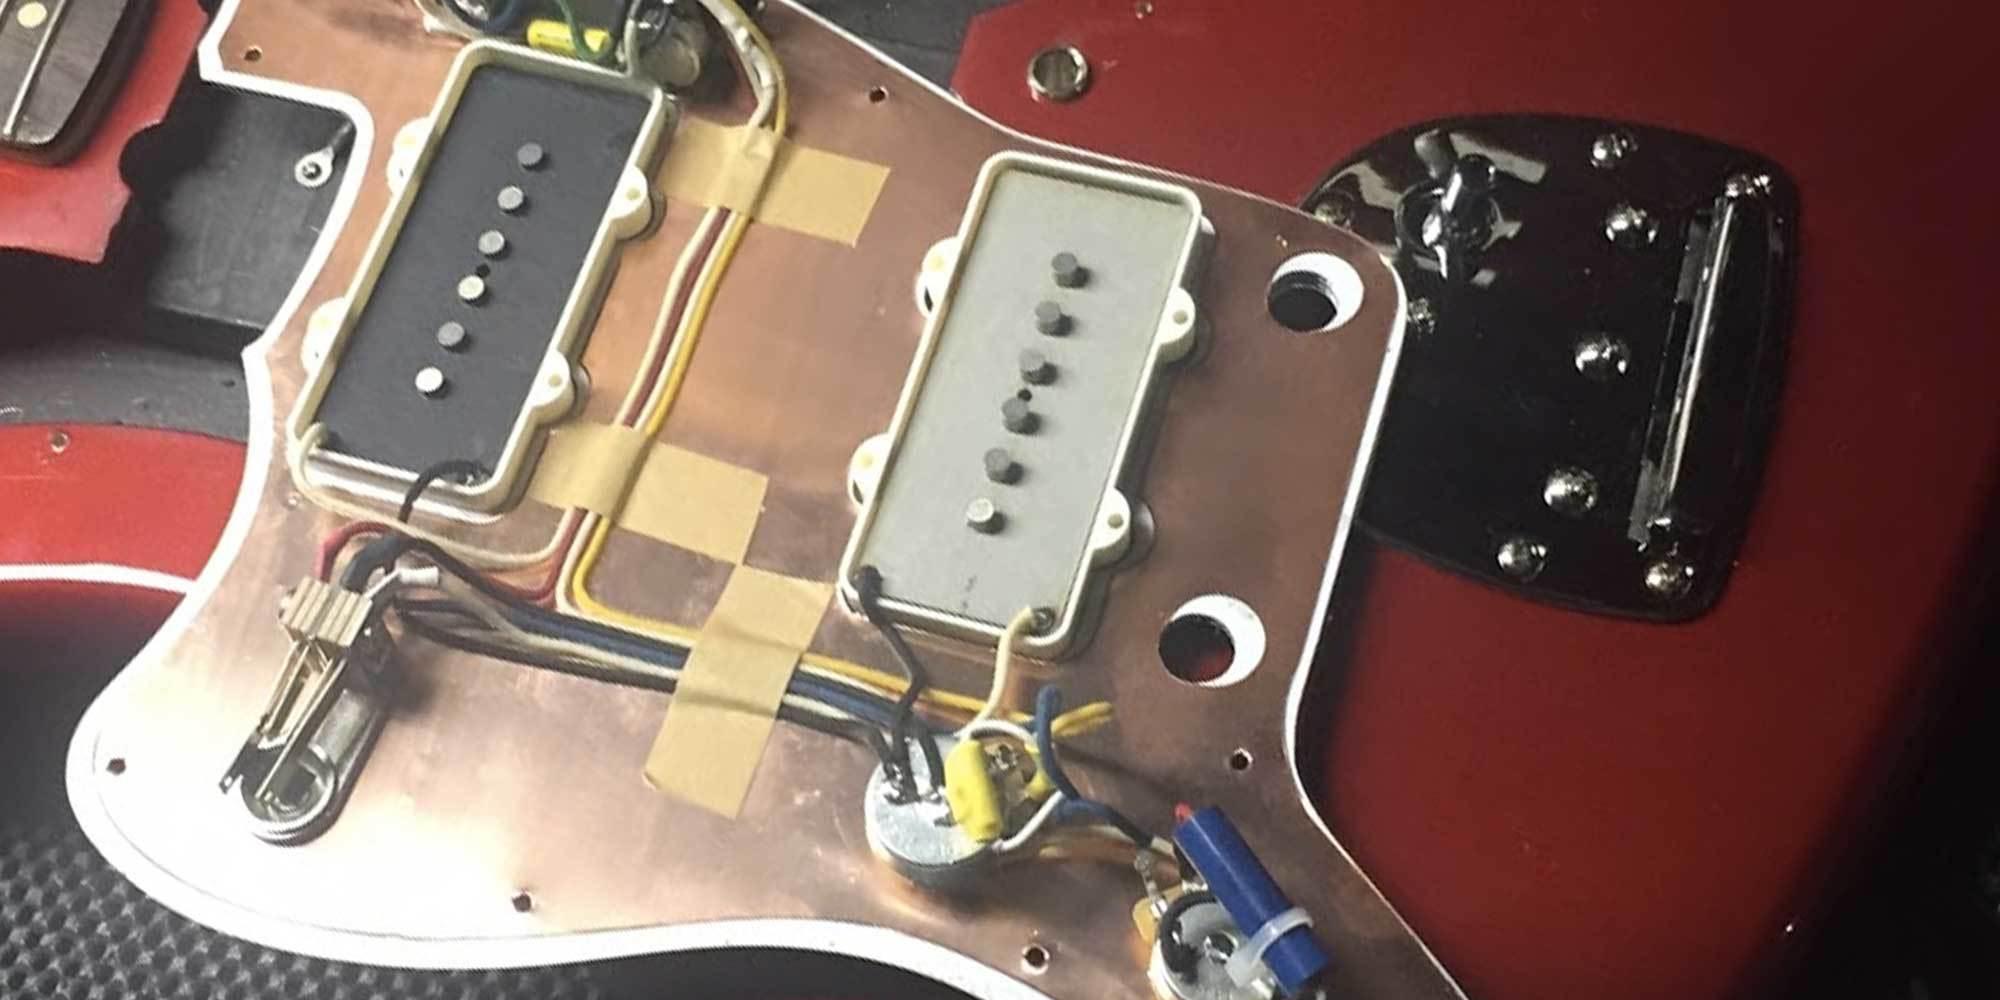 Upgrading Jazzmaster Electronics: Unleash The Potential | Reverb News - Jazzmaster Wiring Diagram